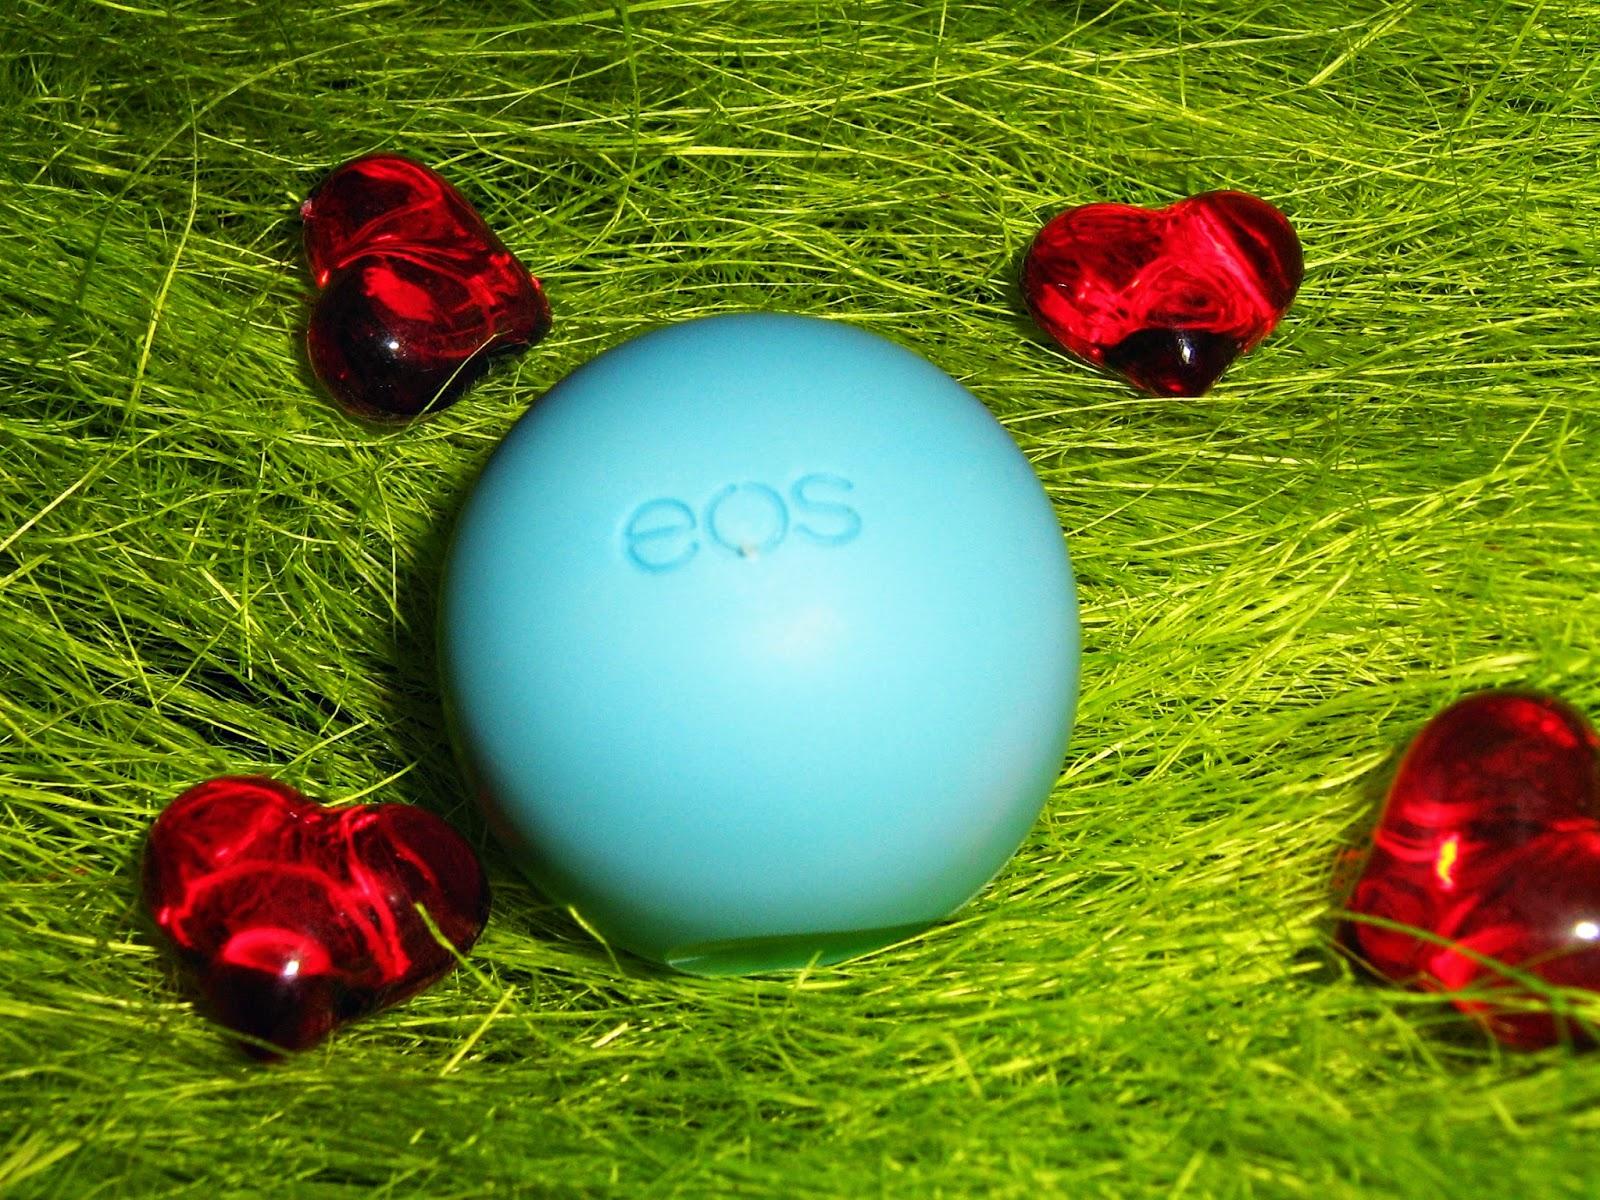 EOS Balsam do ust blueberry acai - znane, jagodowe jajko.